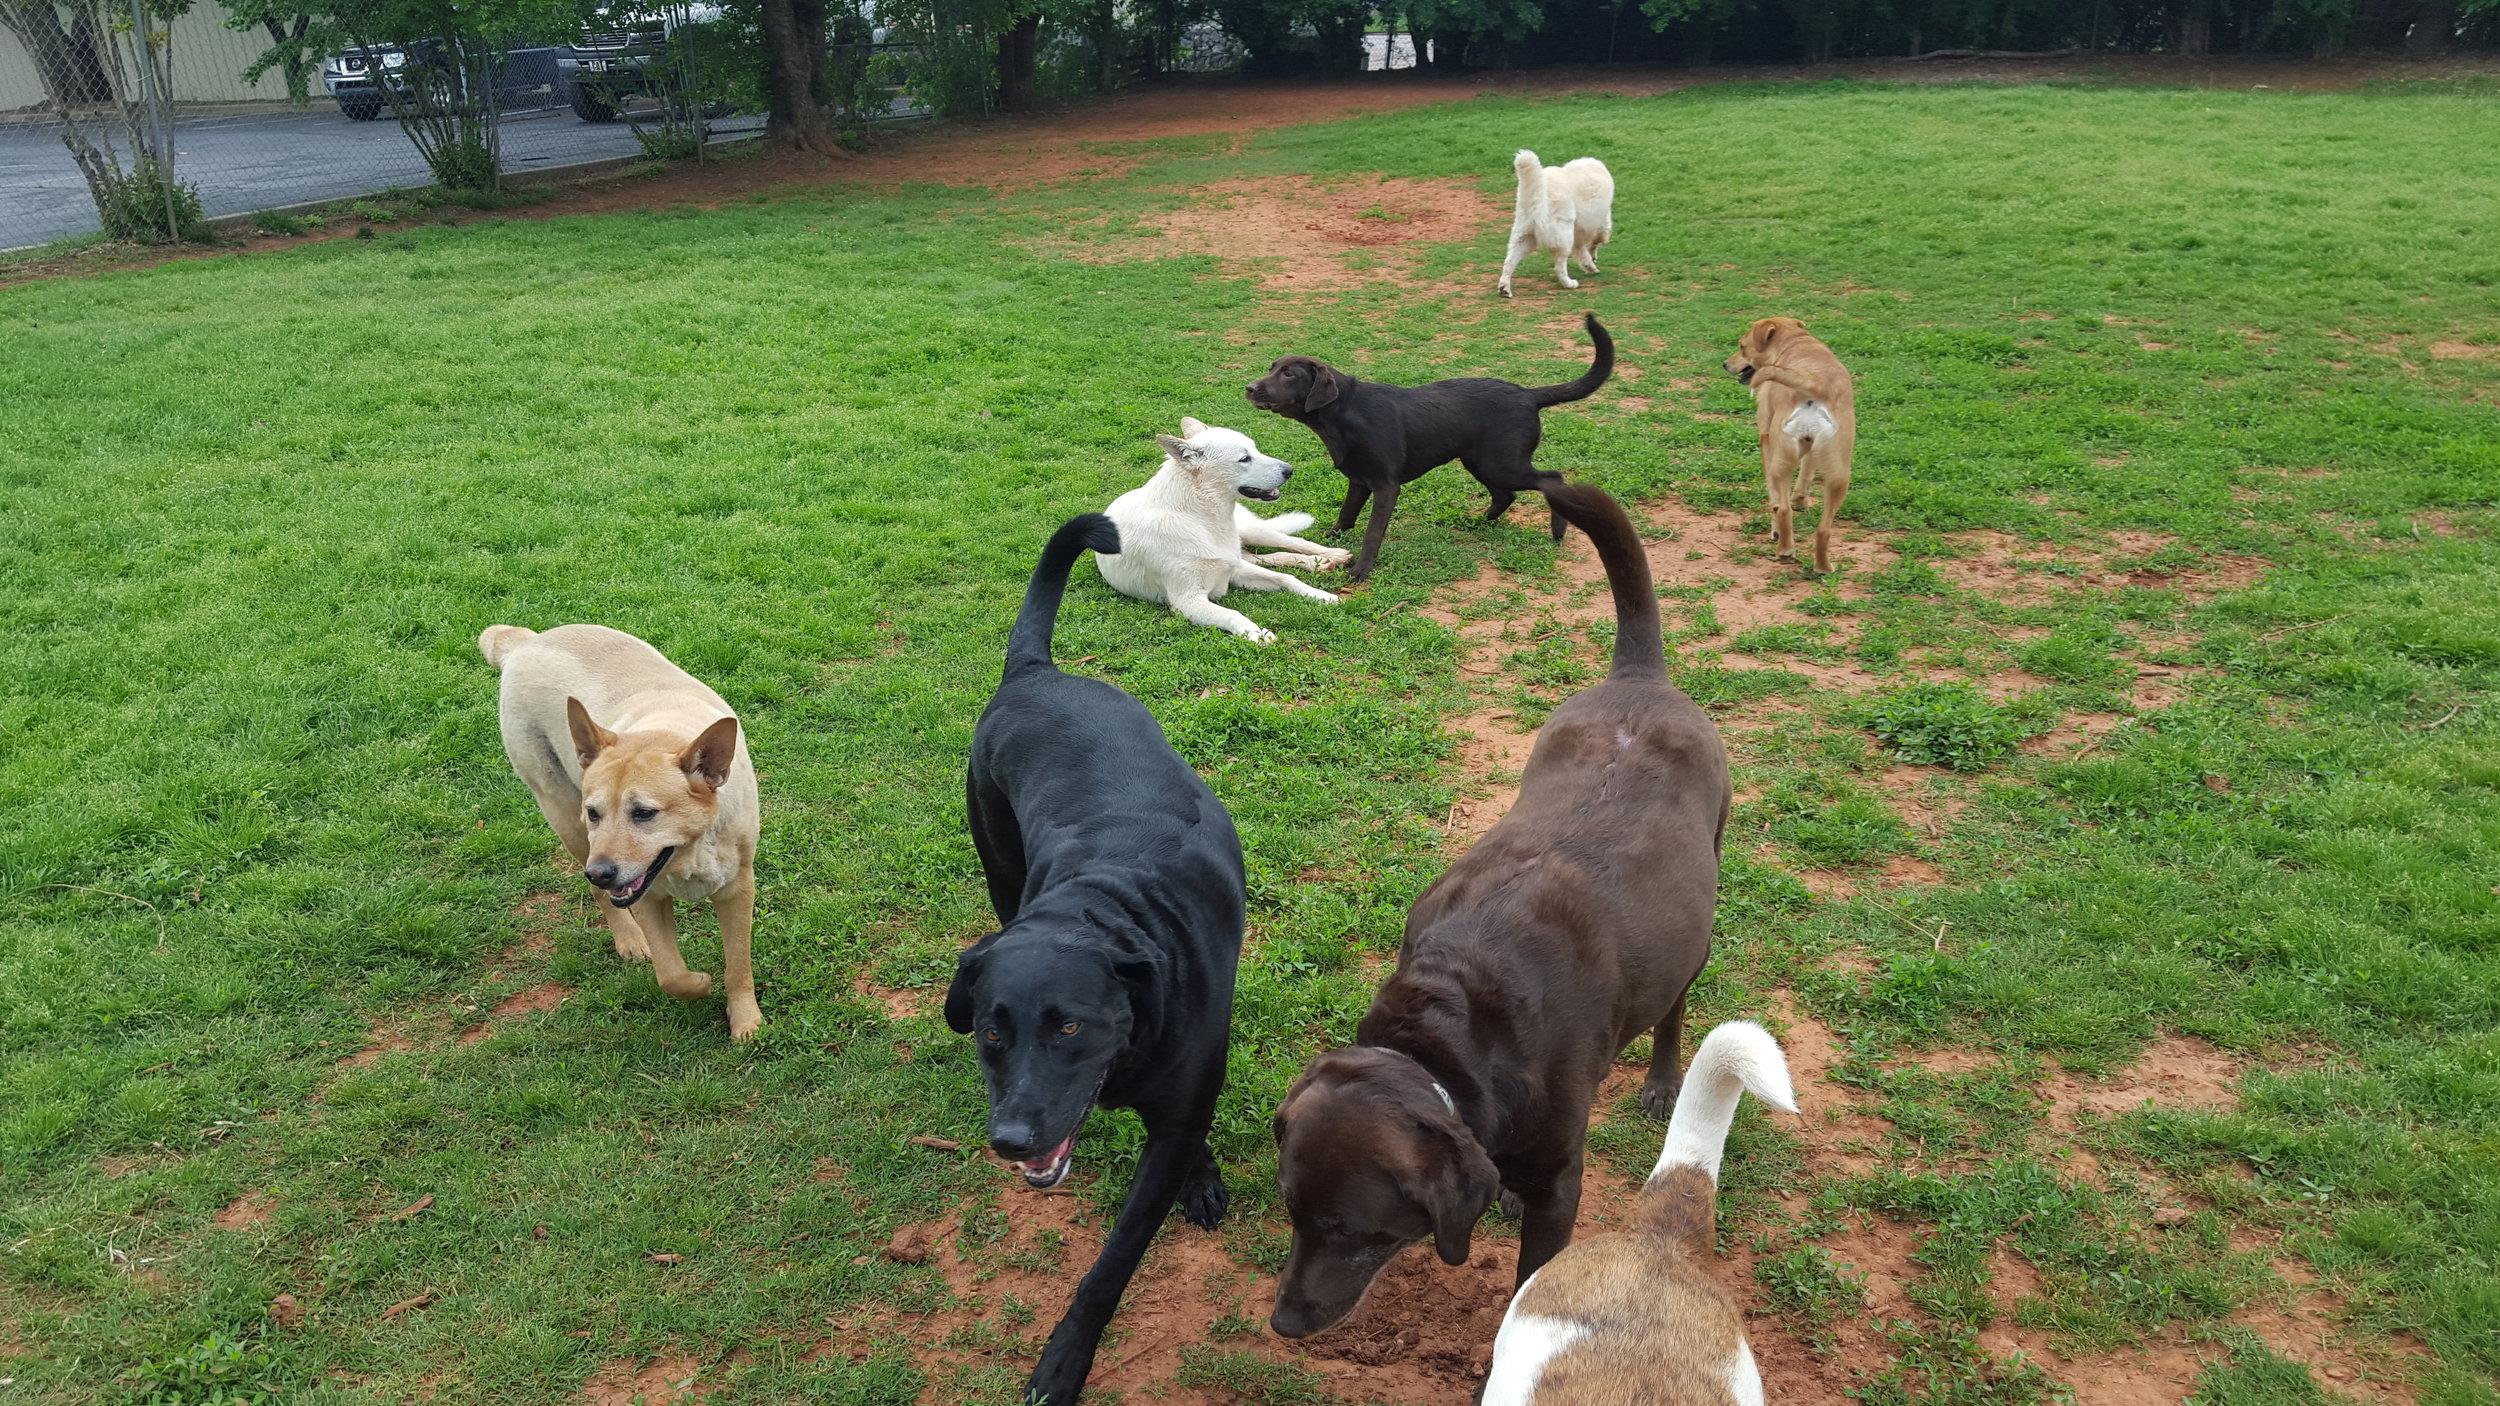 Big Dogs July 2016 (2).jpg